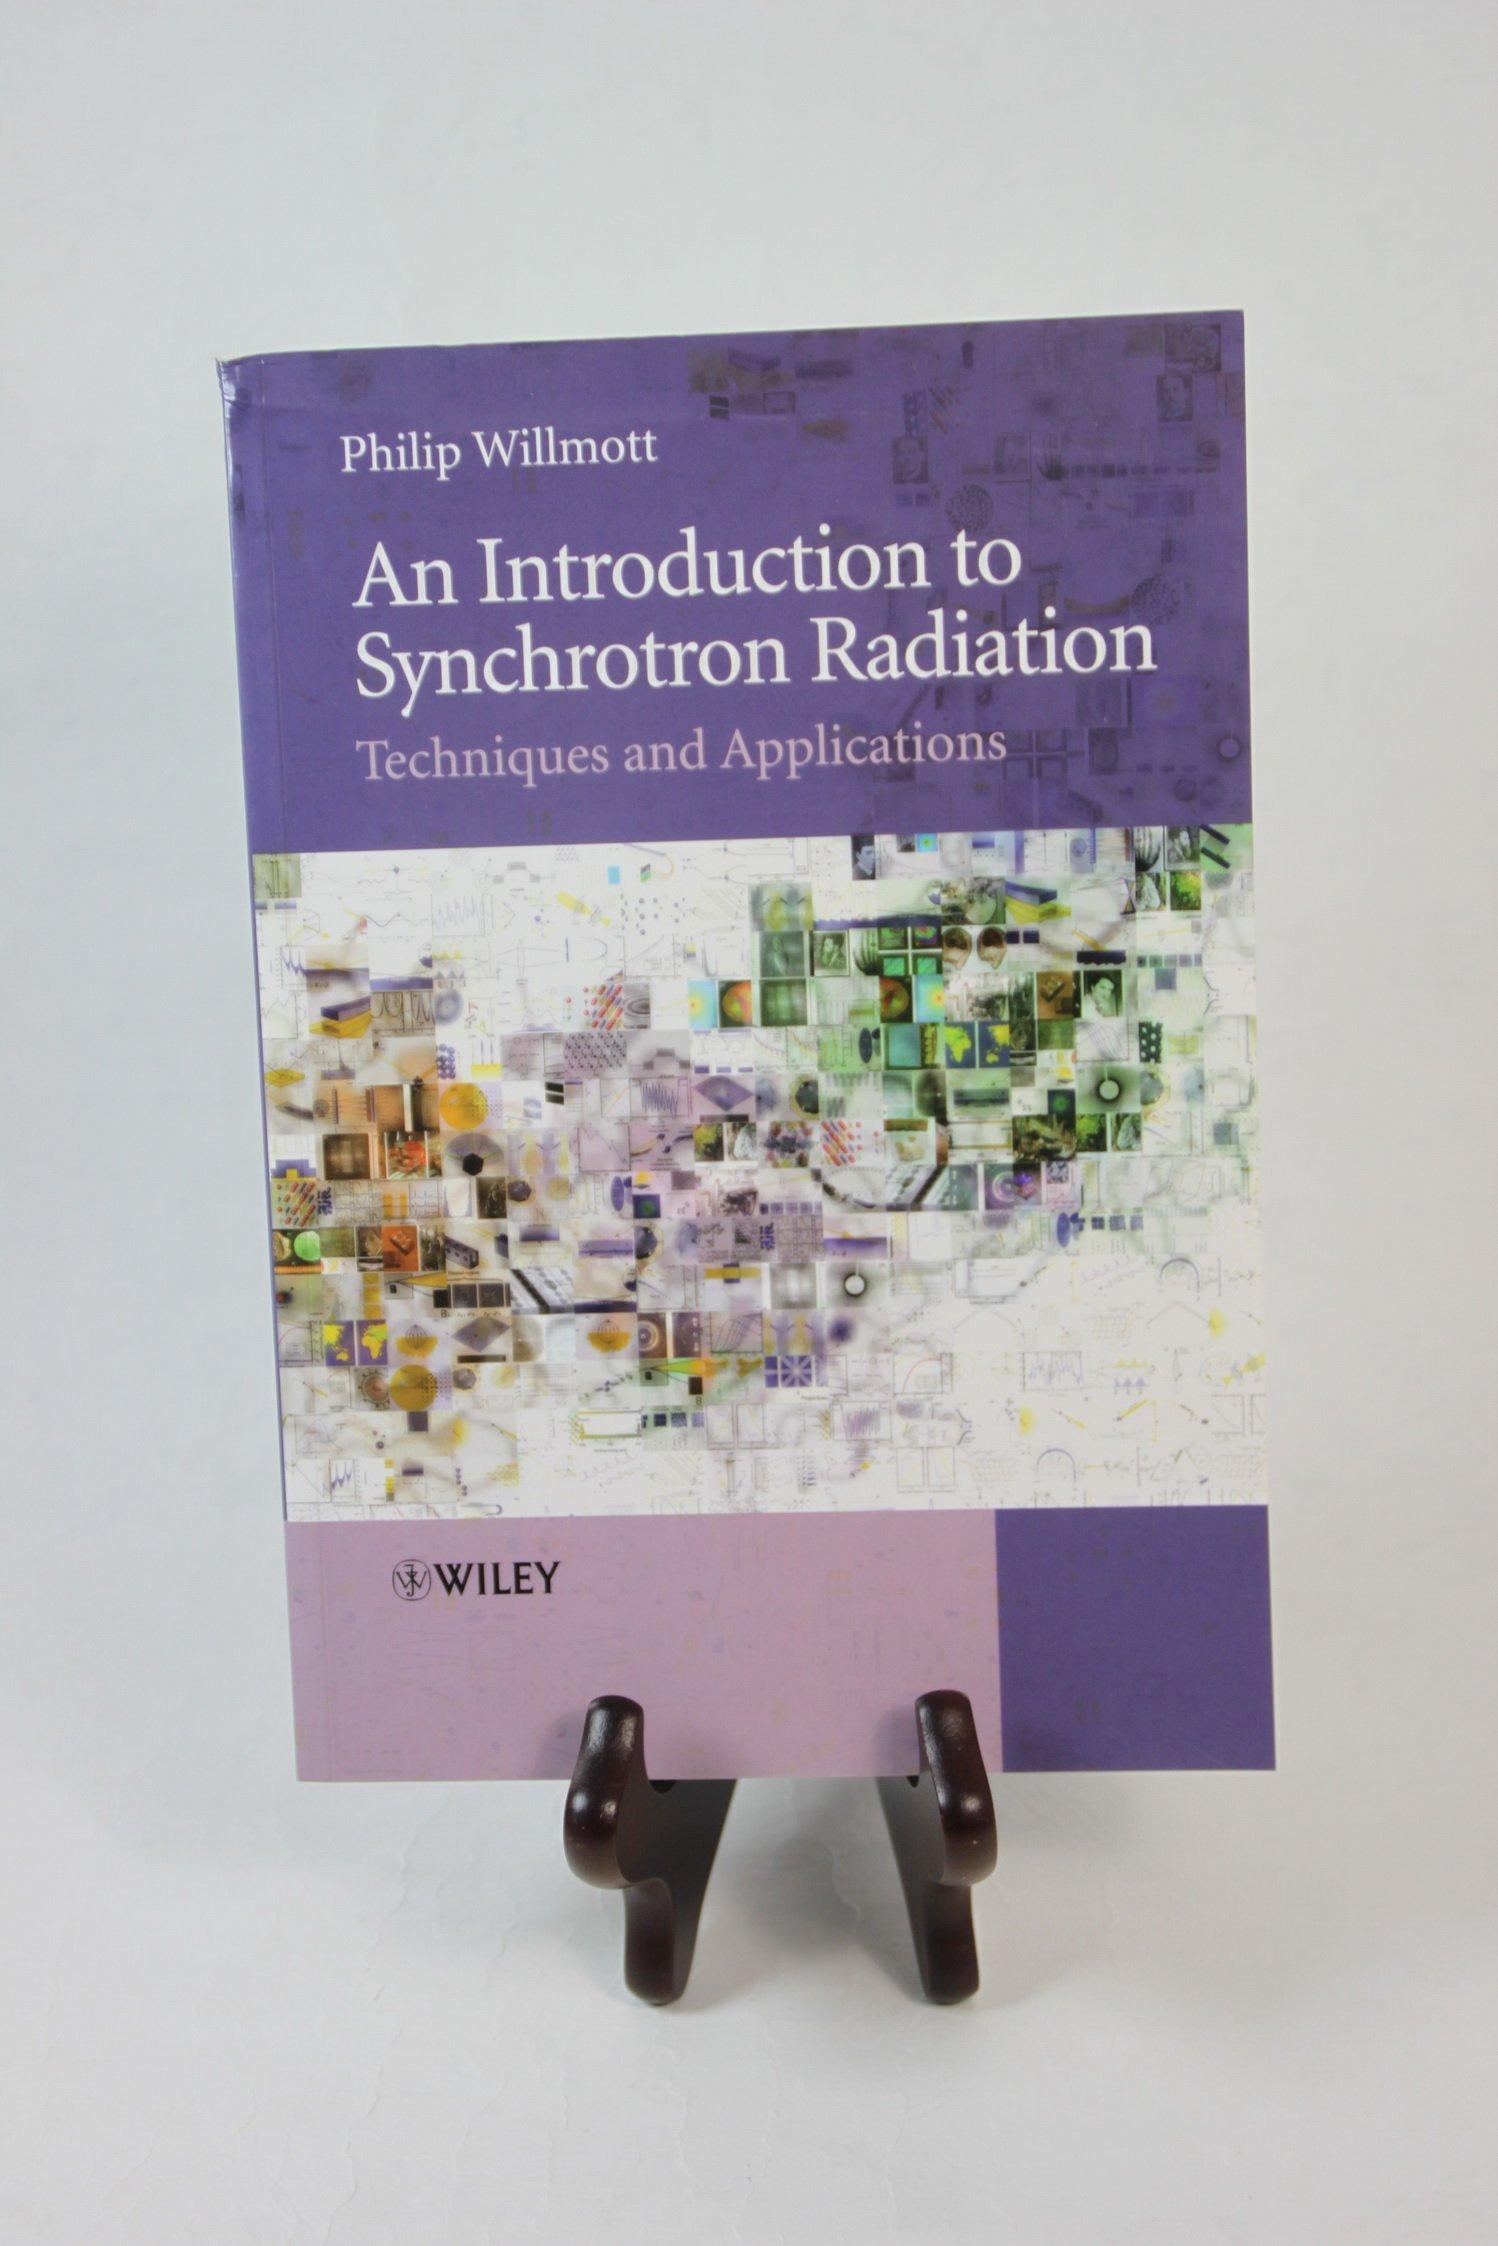 Introduction to Synchrotron Radiation Willmott 9780470745786